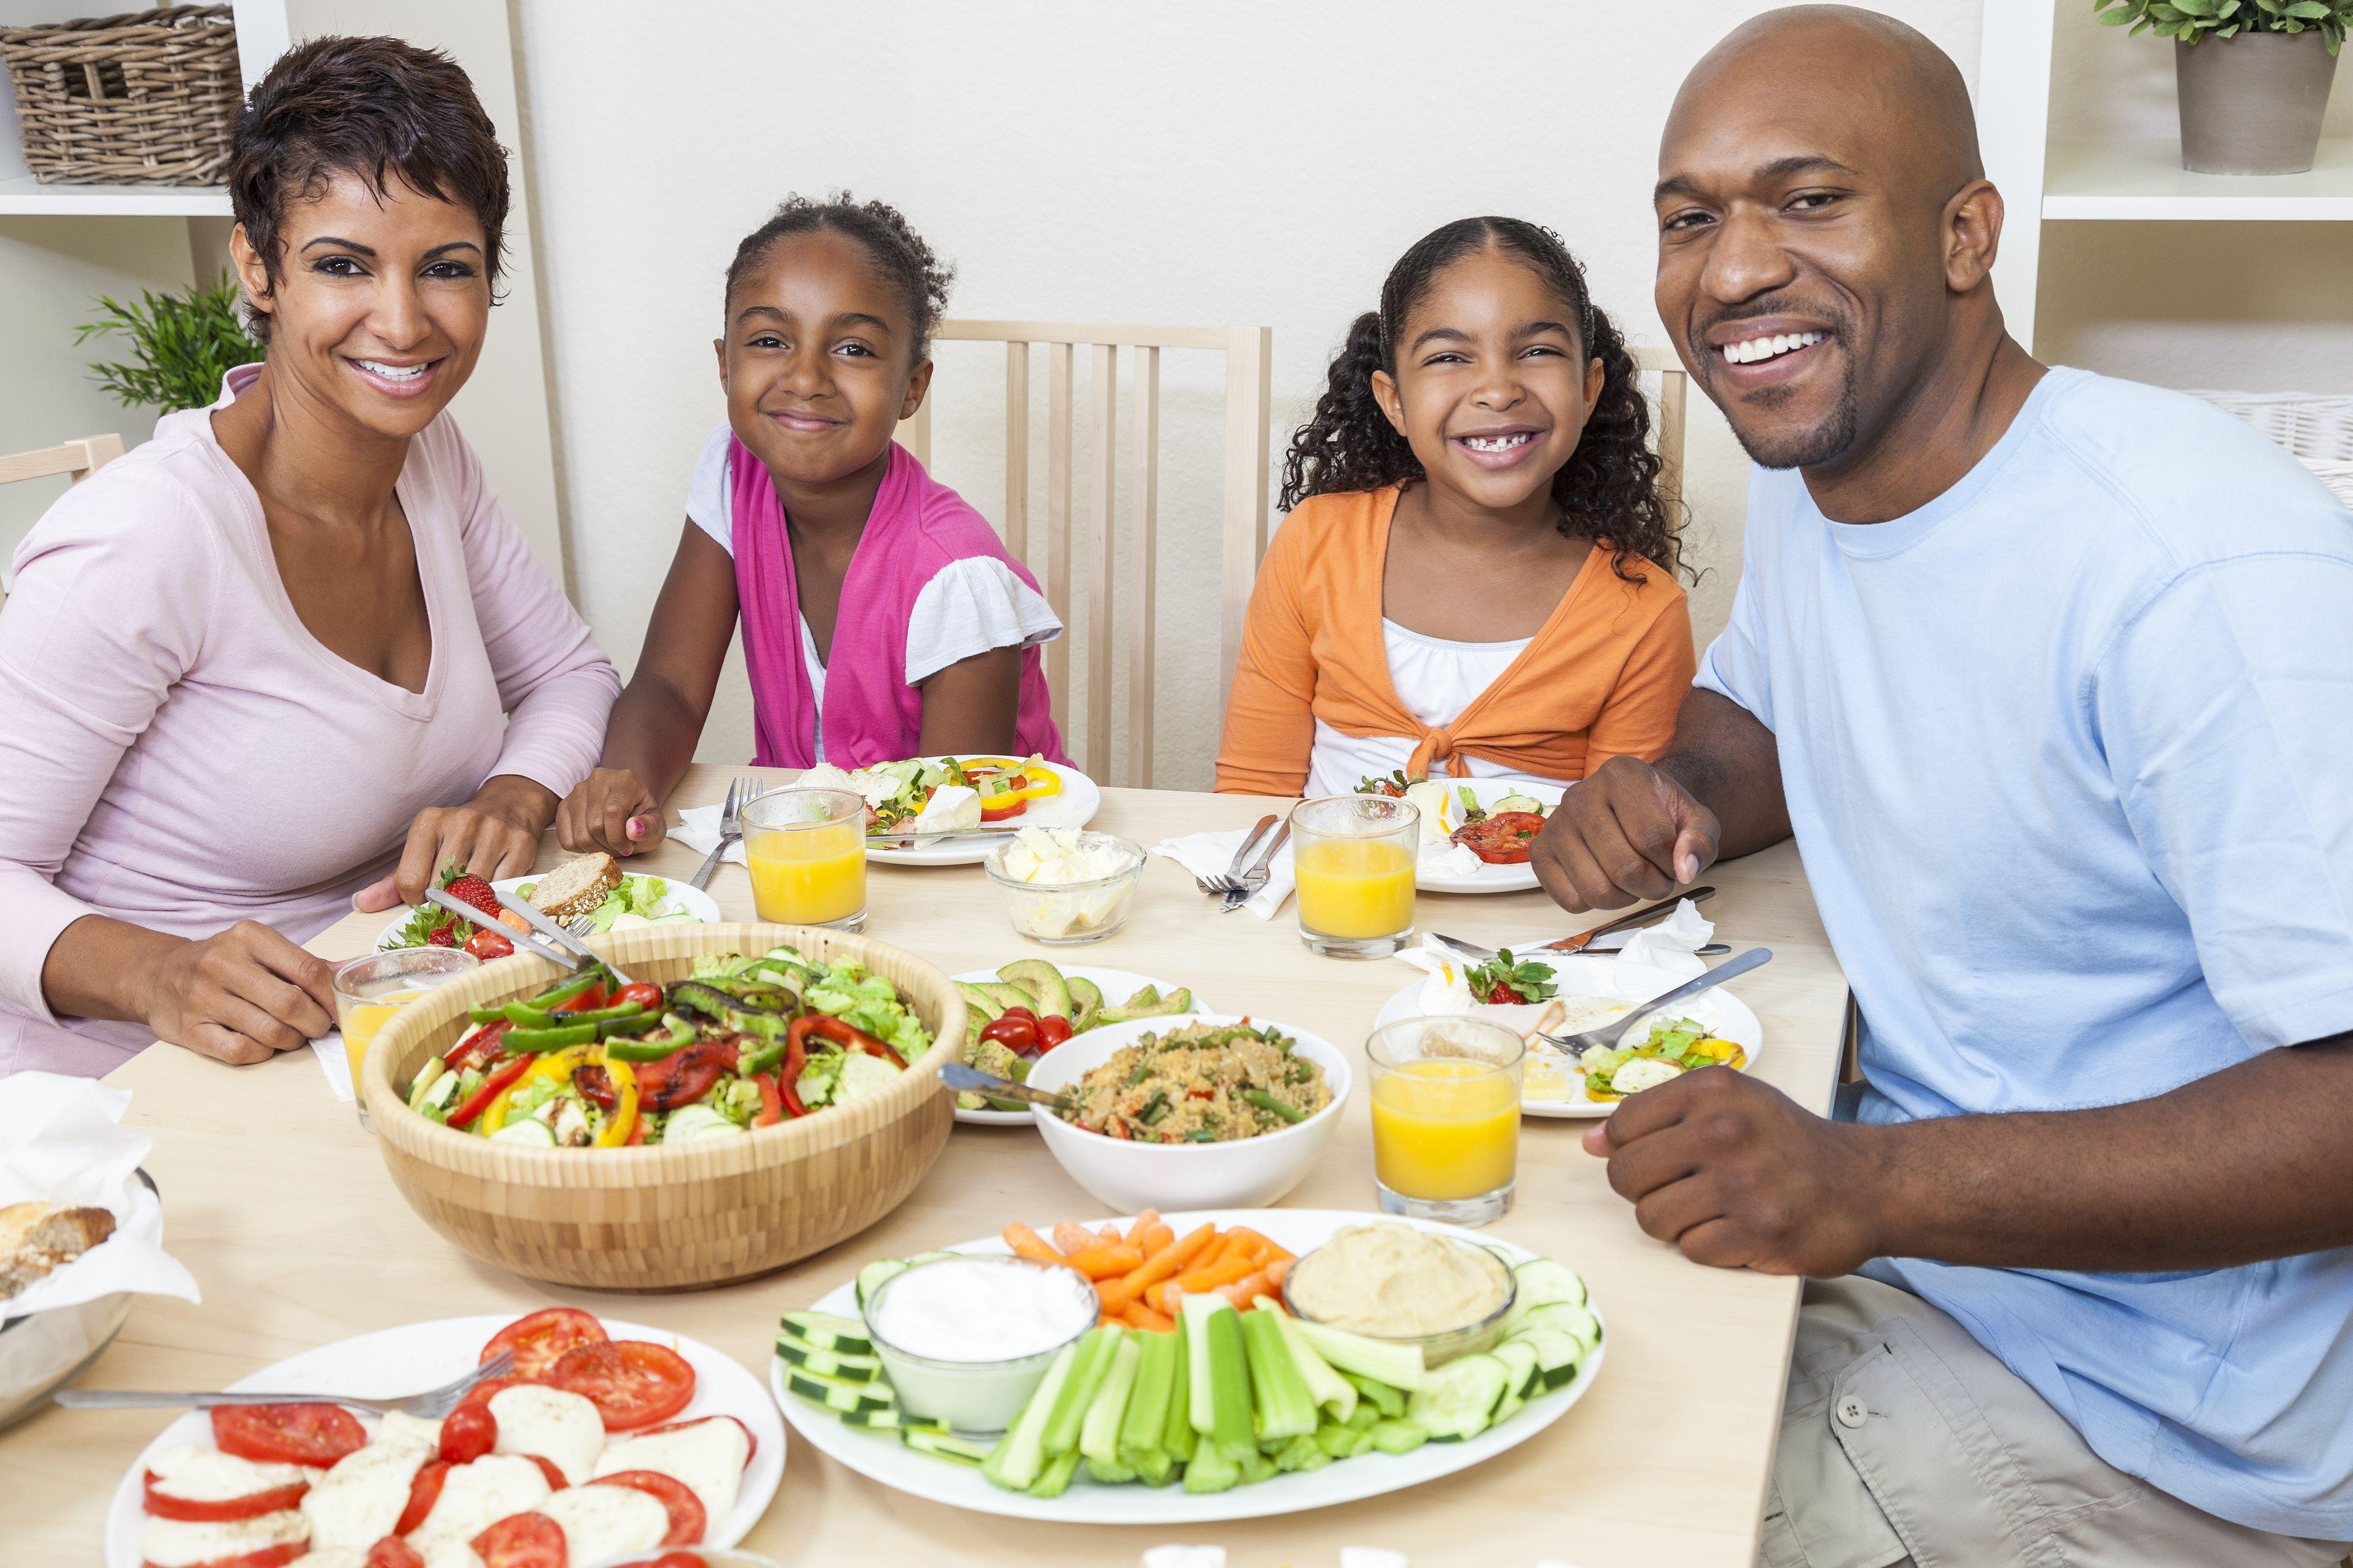 %Health and Wellness Tips%Terry Talks